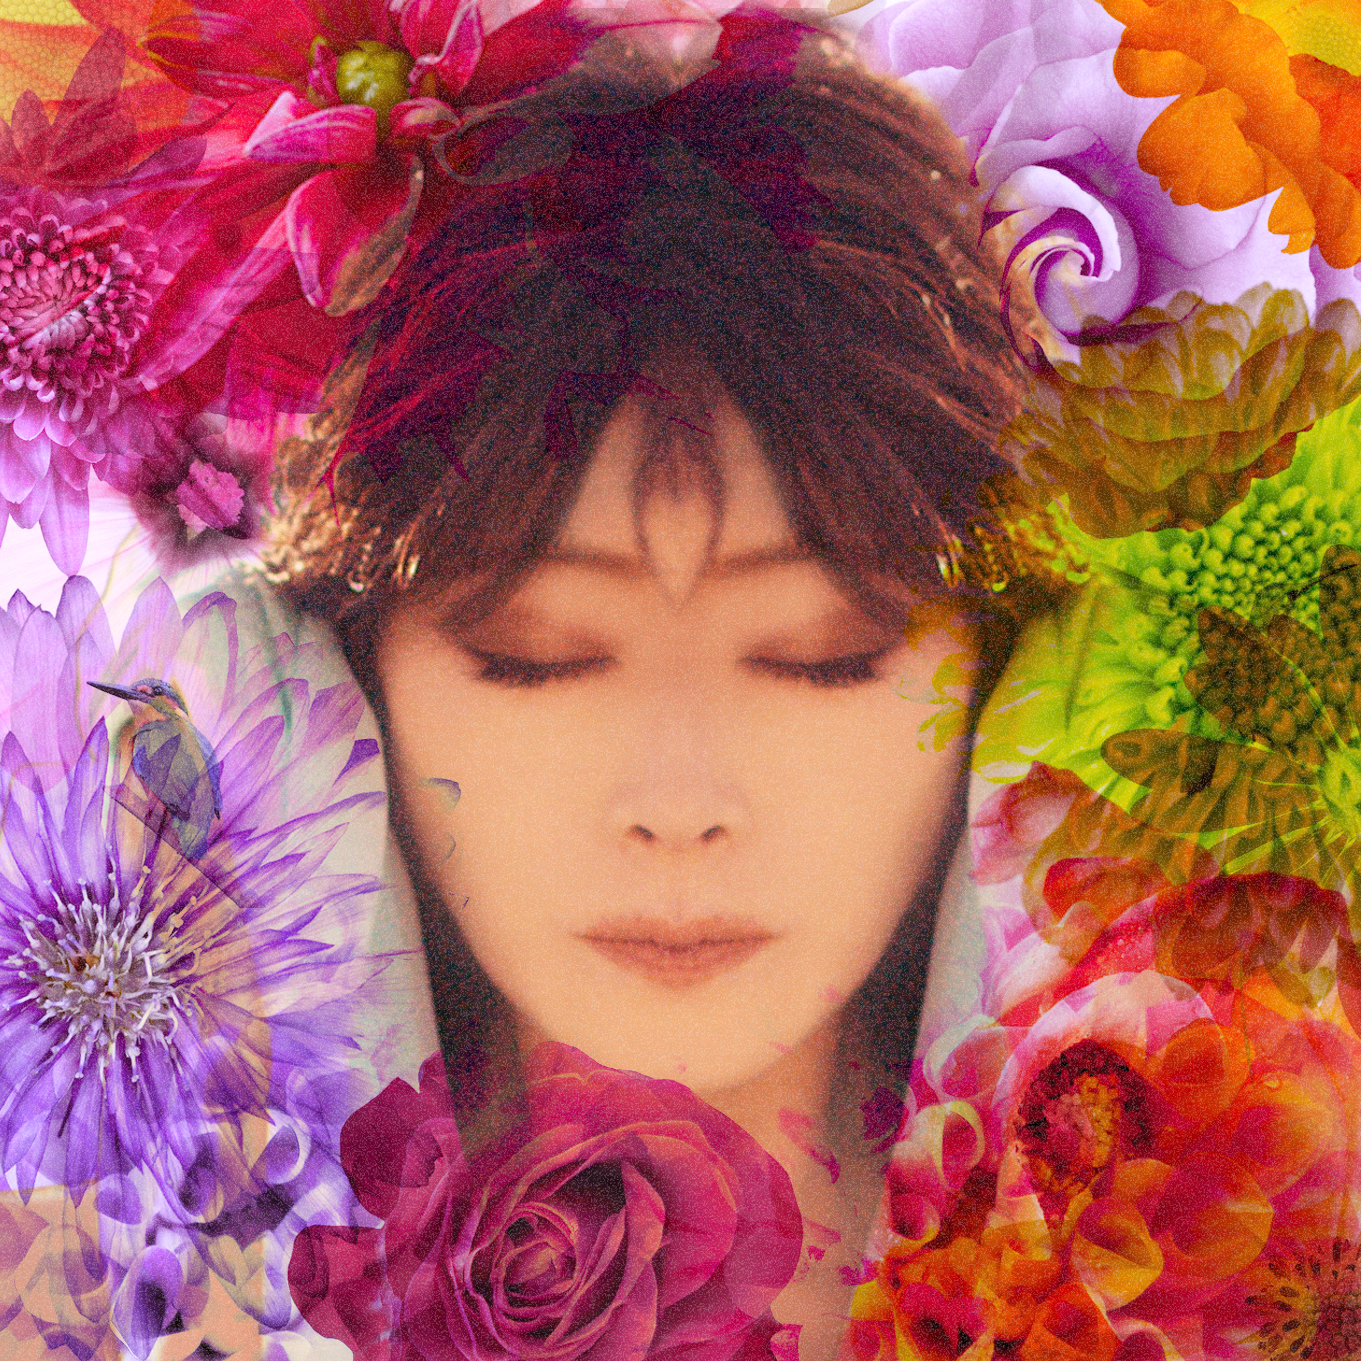 20160107.04.1 Akina Nakamori - Fixer (M4A) cover 2.jpg